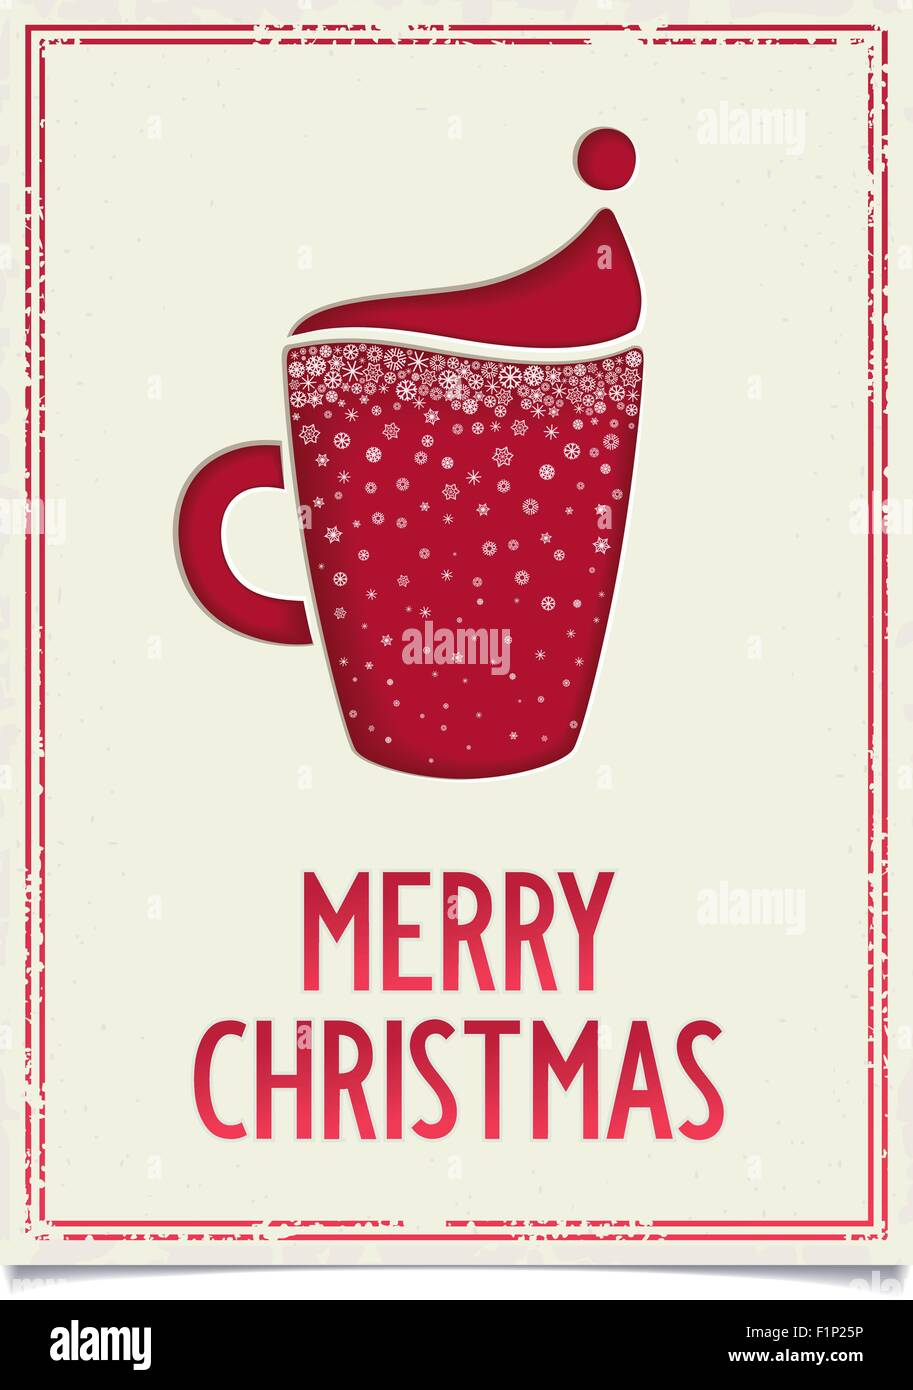 Christmas Restaurant Poster.Sweet Merry Christmas Poster Design For Restaurant And Cafe